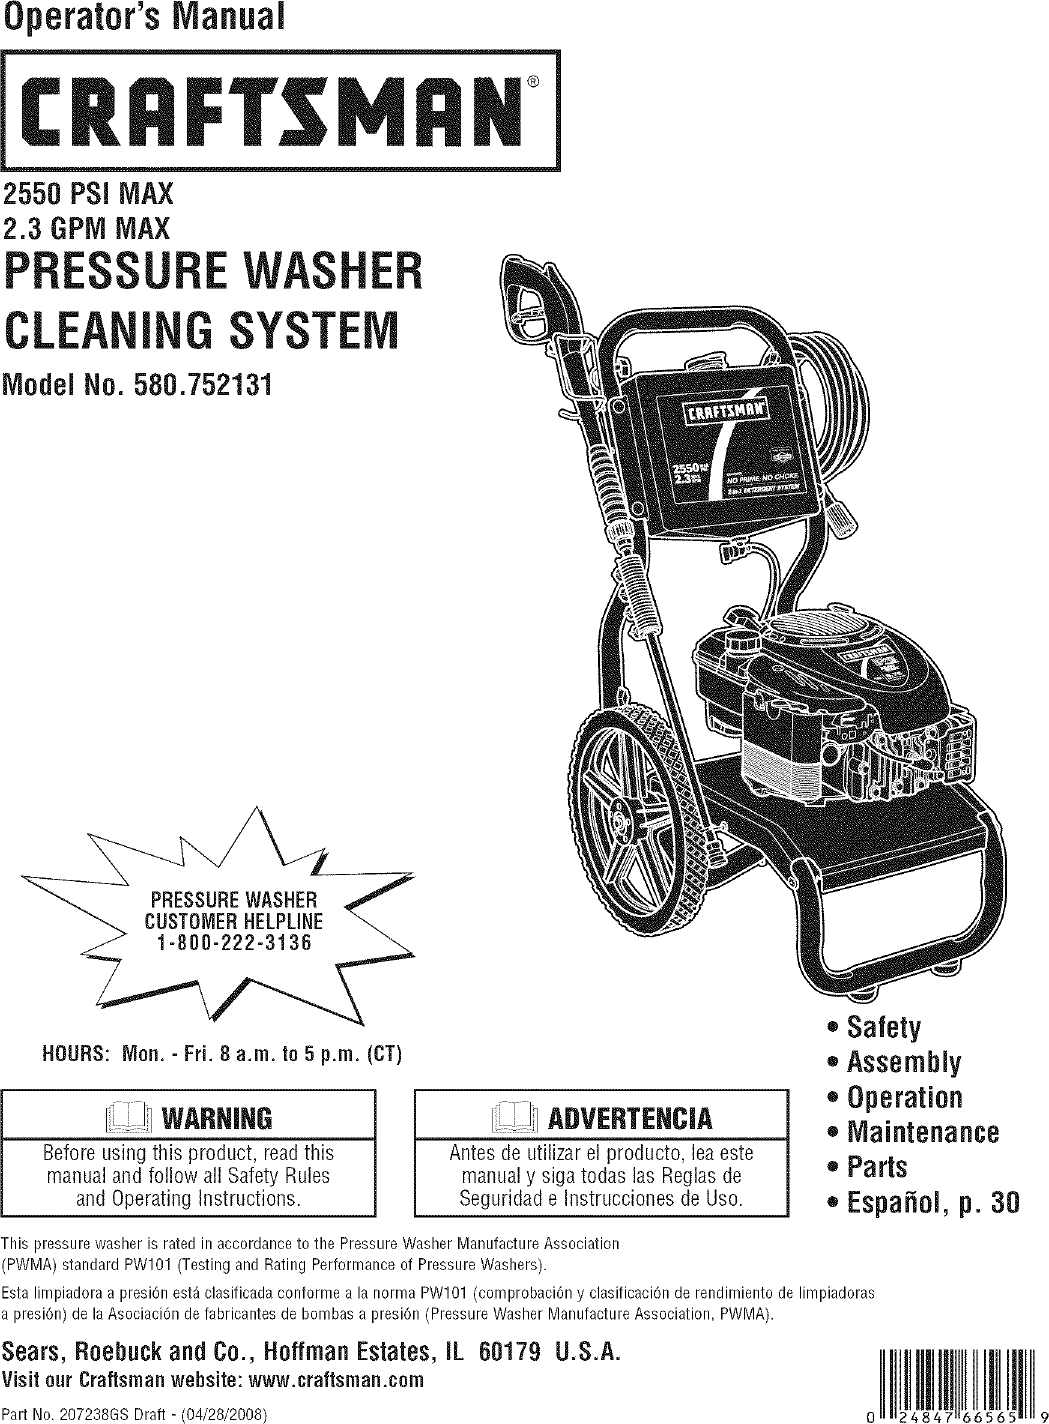 Craftsman 580. 752710 operating instructions   manualzz. Com.